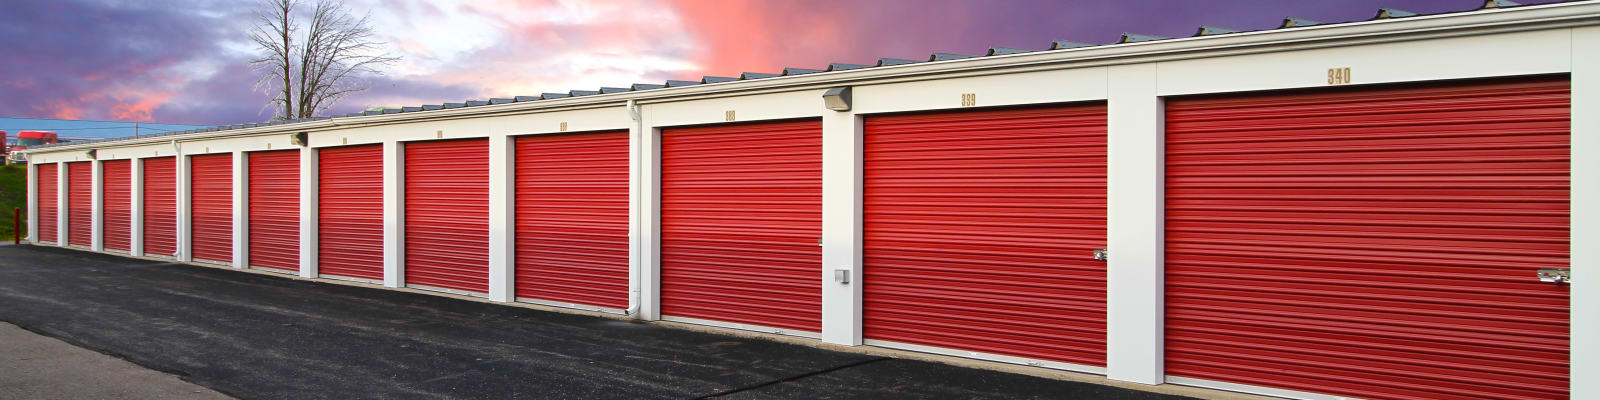 Storage units at West Dickman Road Self Storage in Springfield, MI